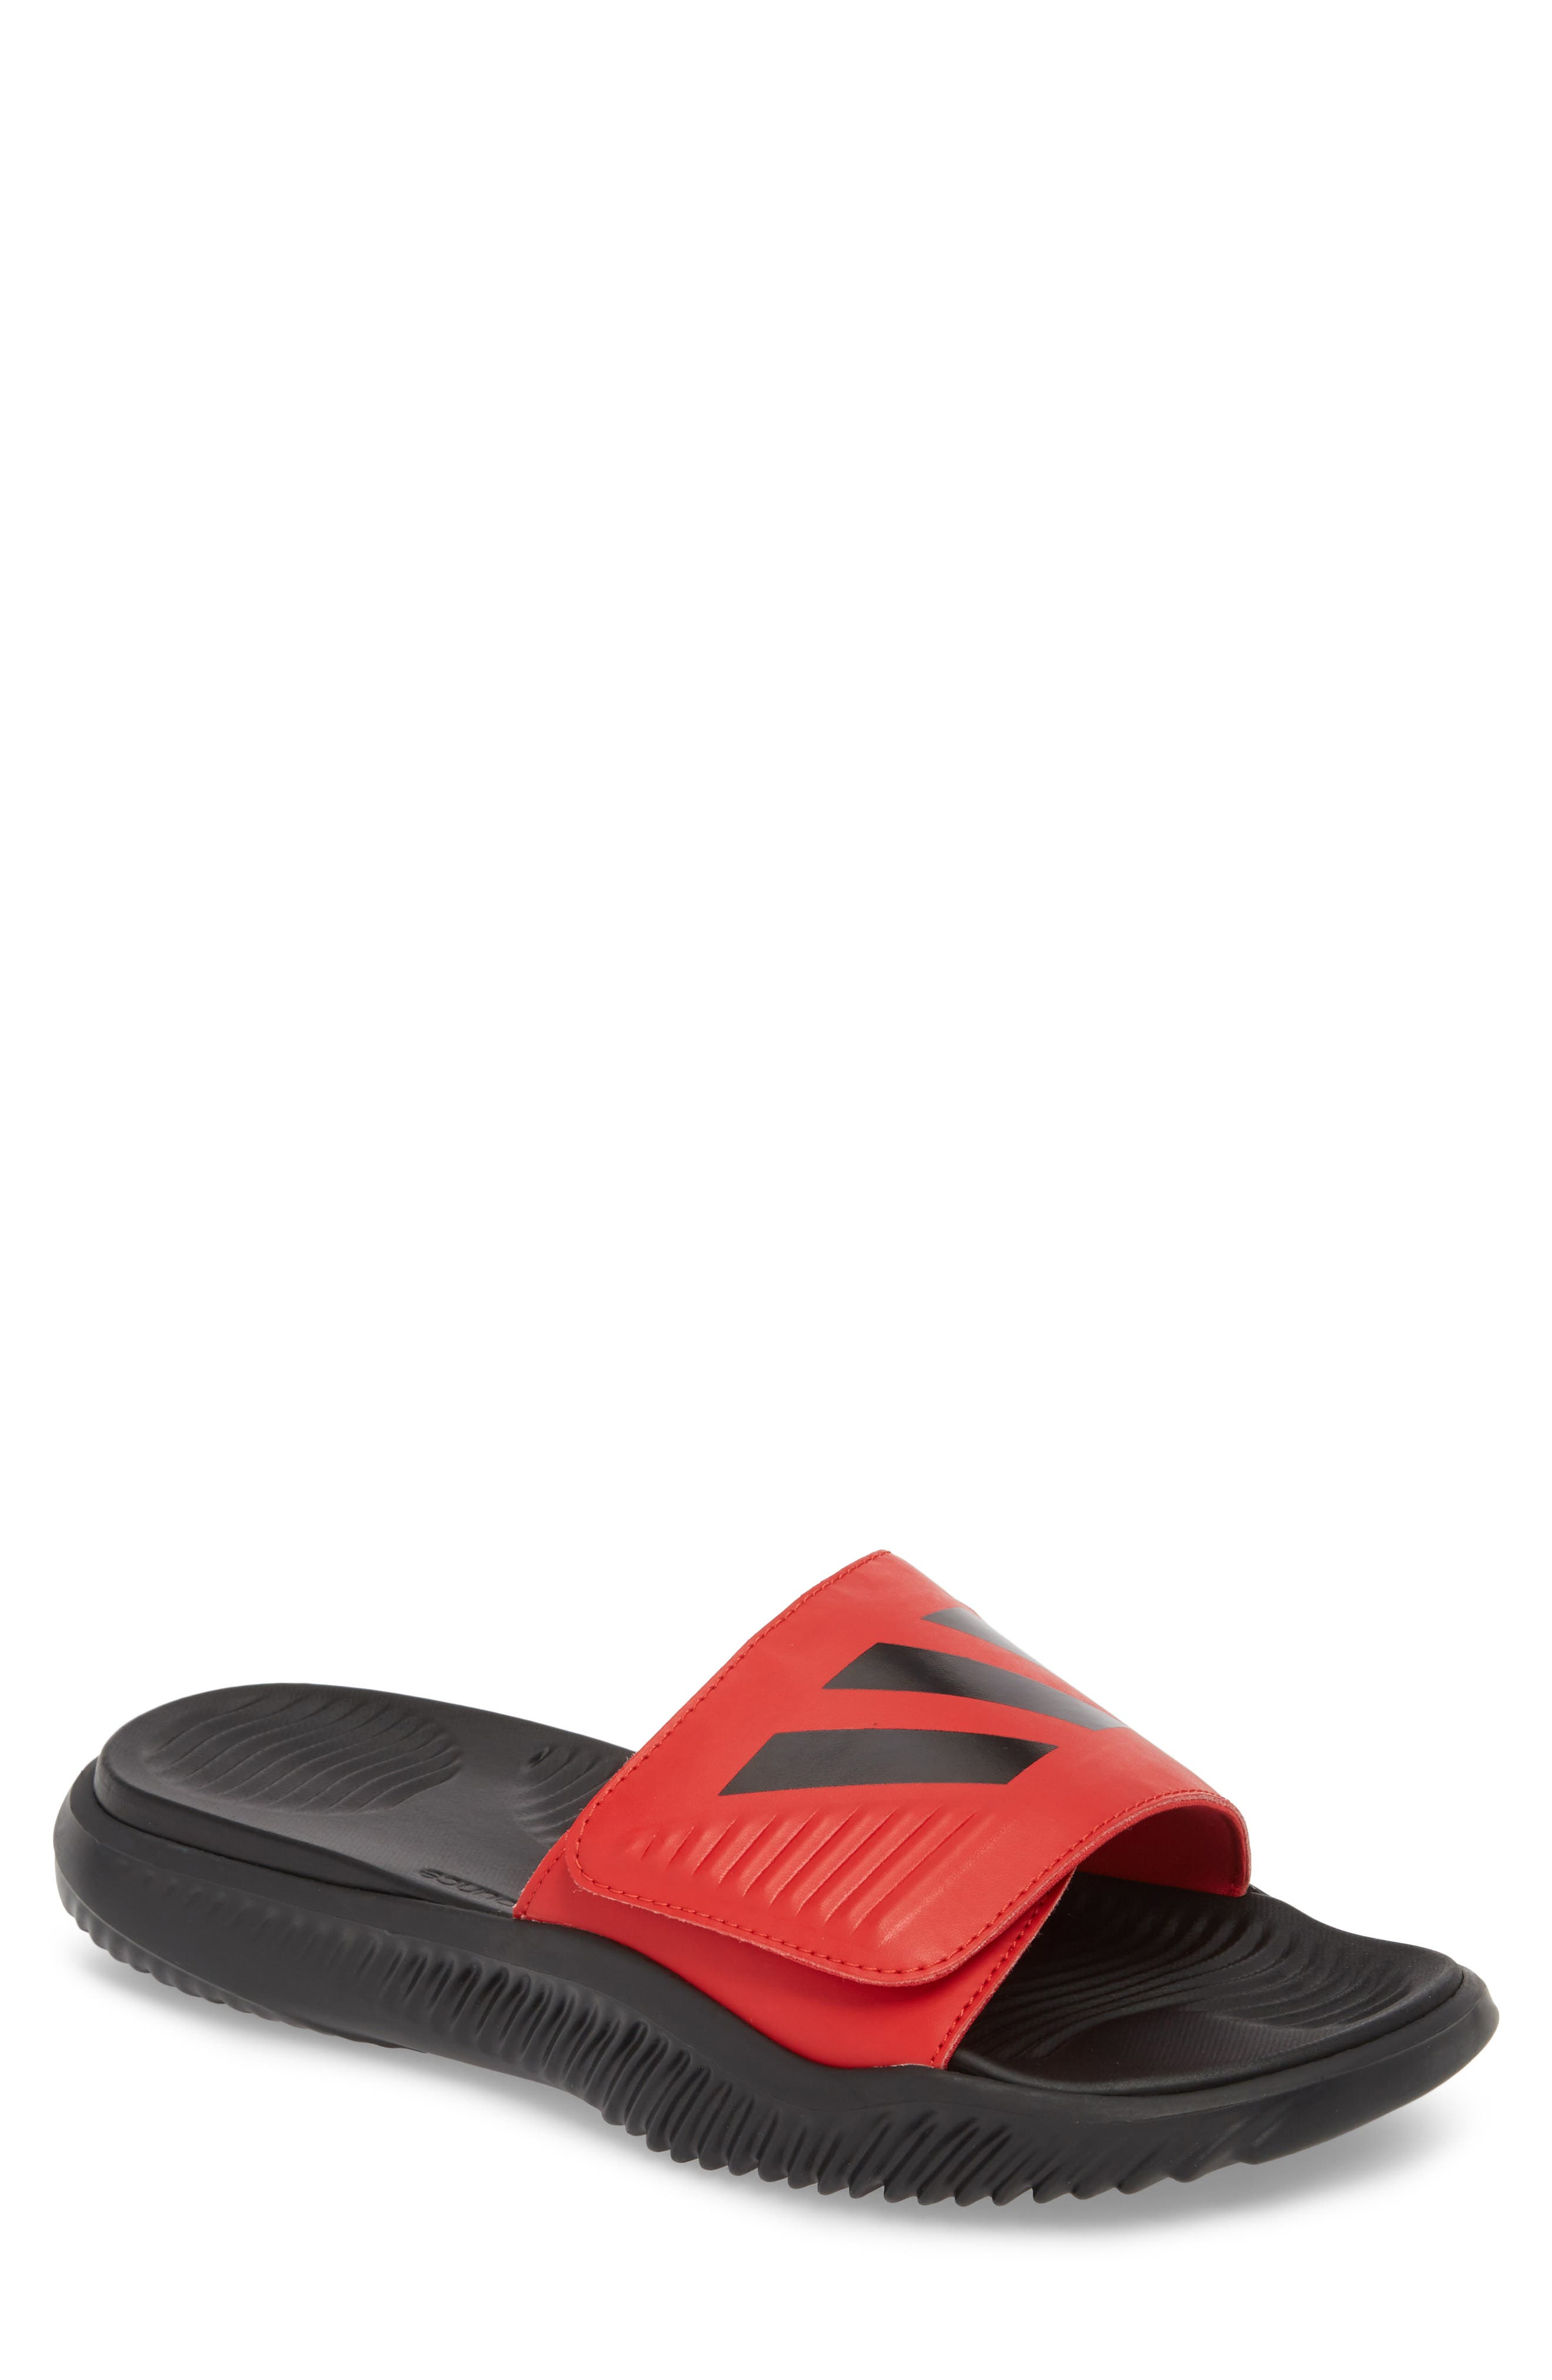 uomini è adidas sandali, diapositive & infradito nordstrom